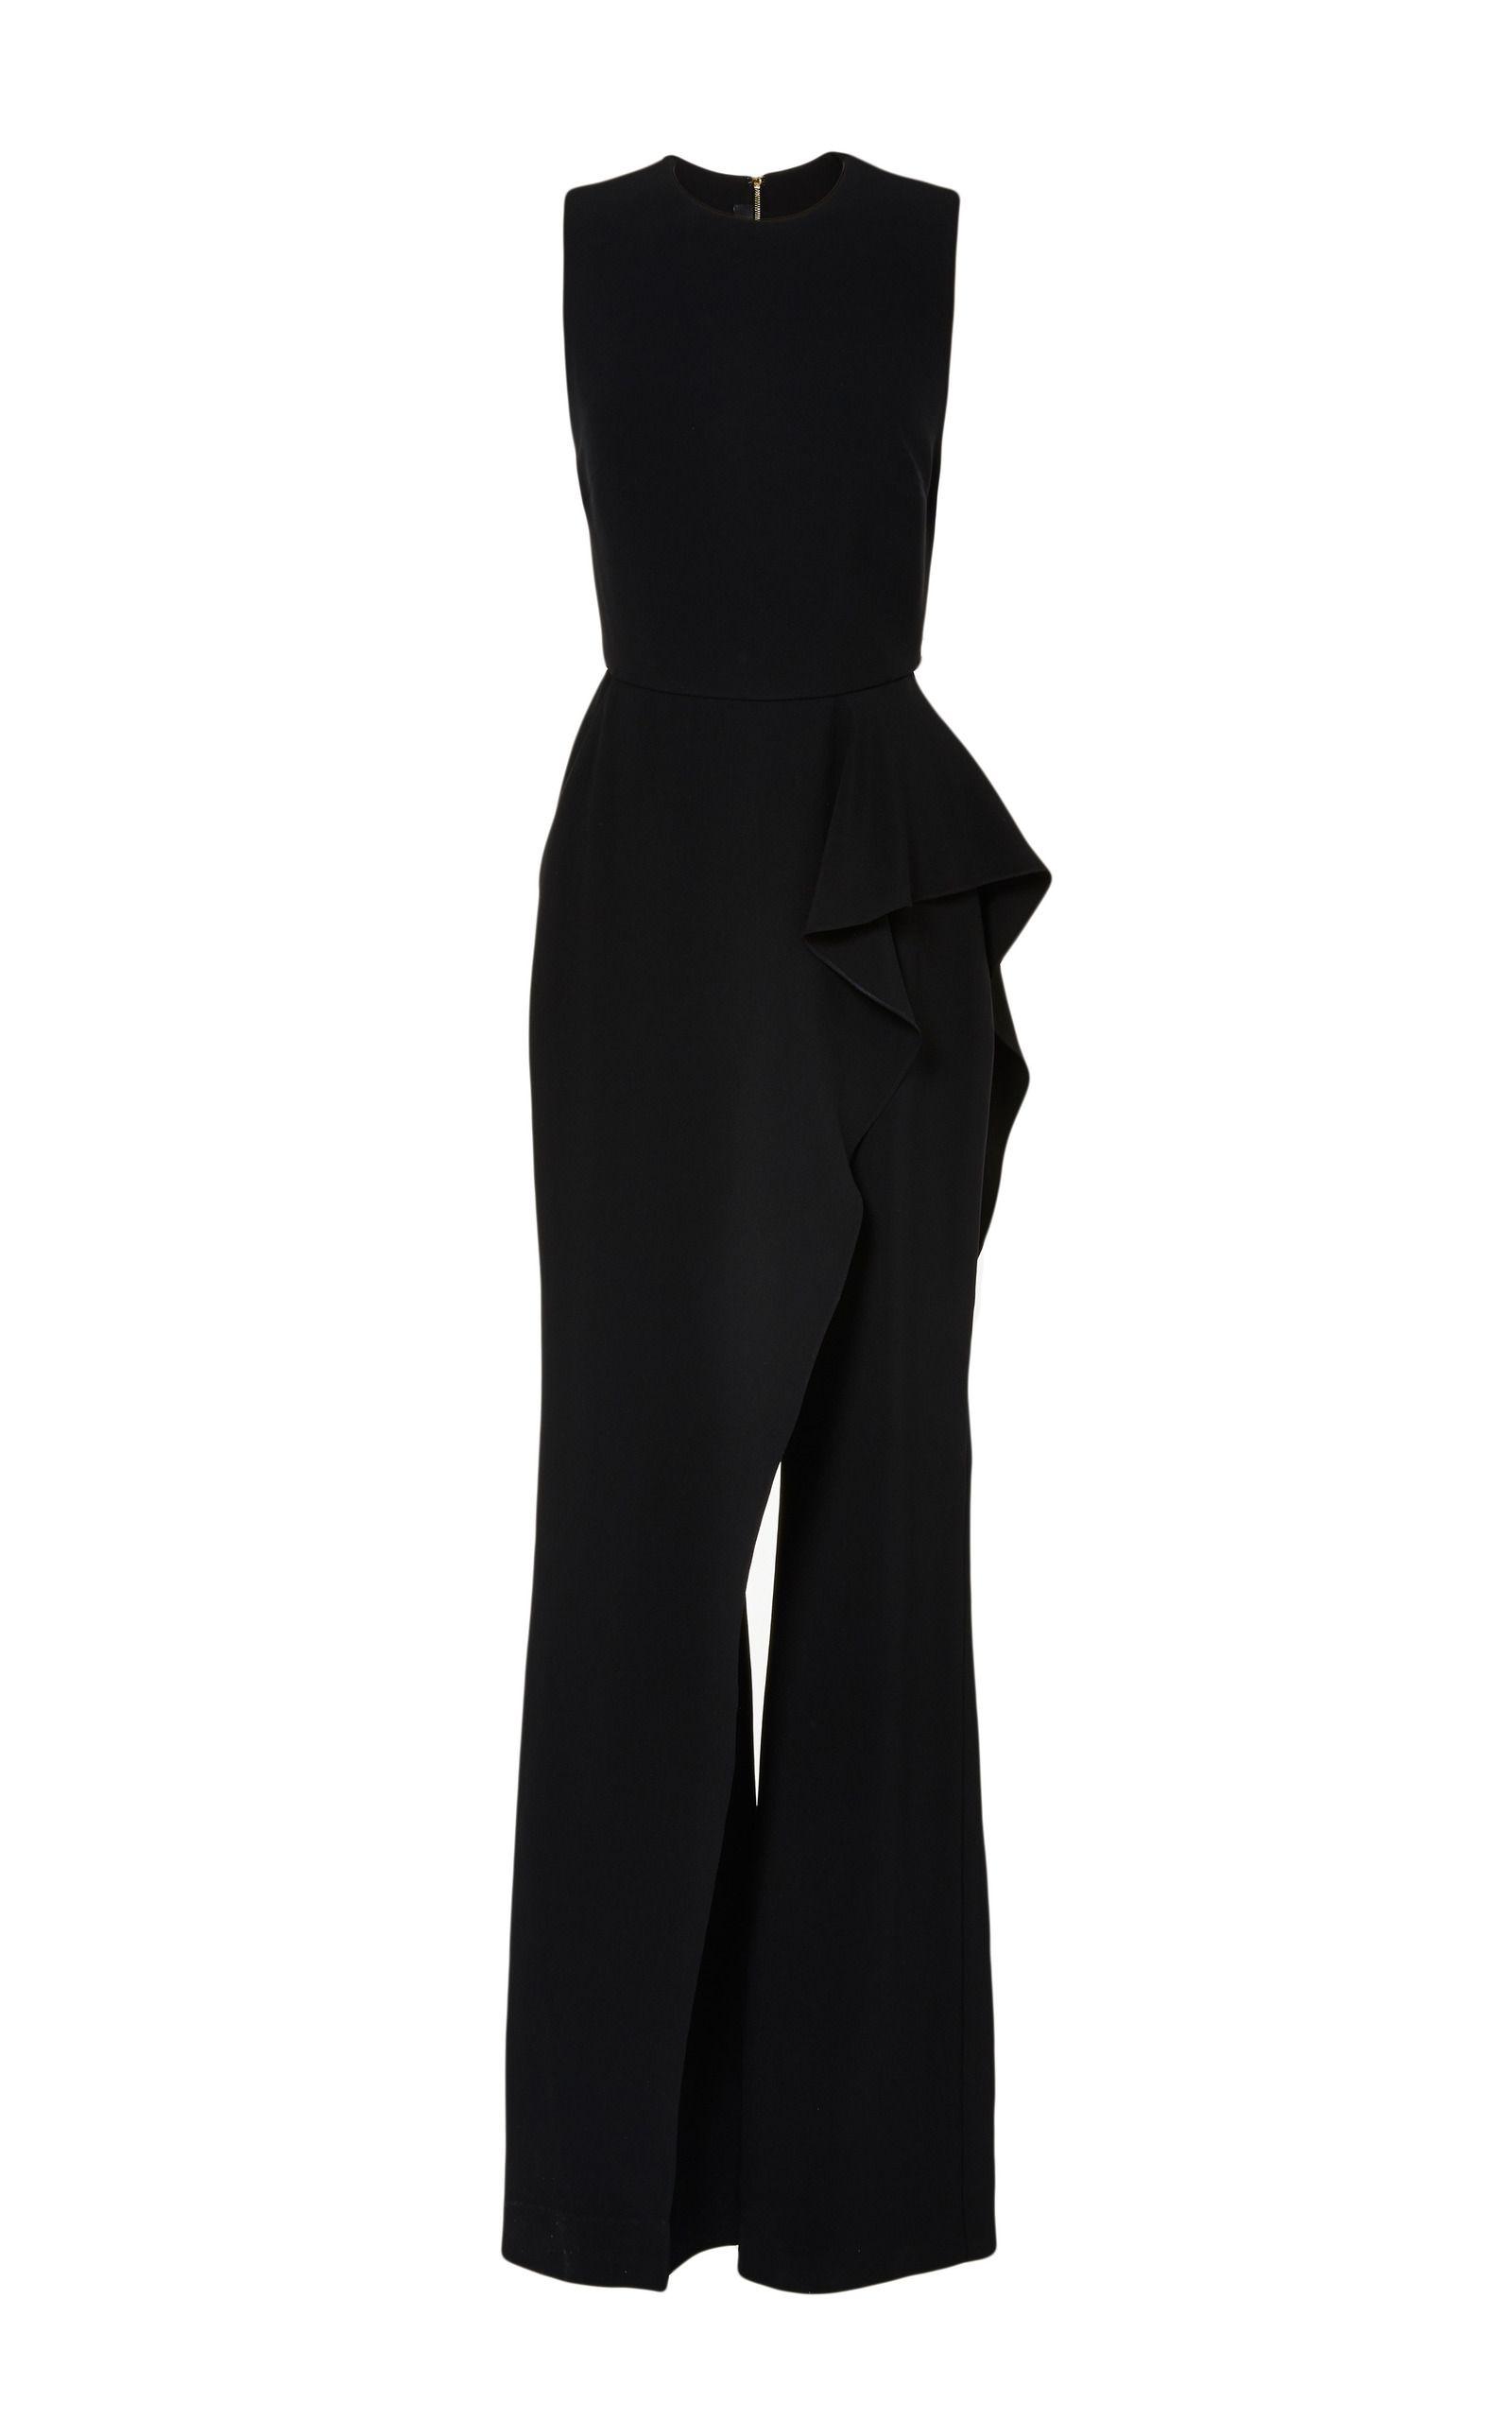 Black Stretch Cady Jumpsuit by Elie Saab for Preorder on Moda Operandi